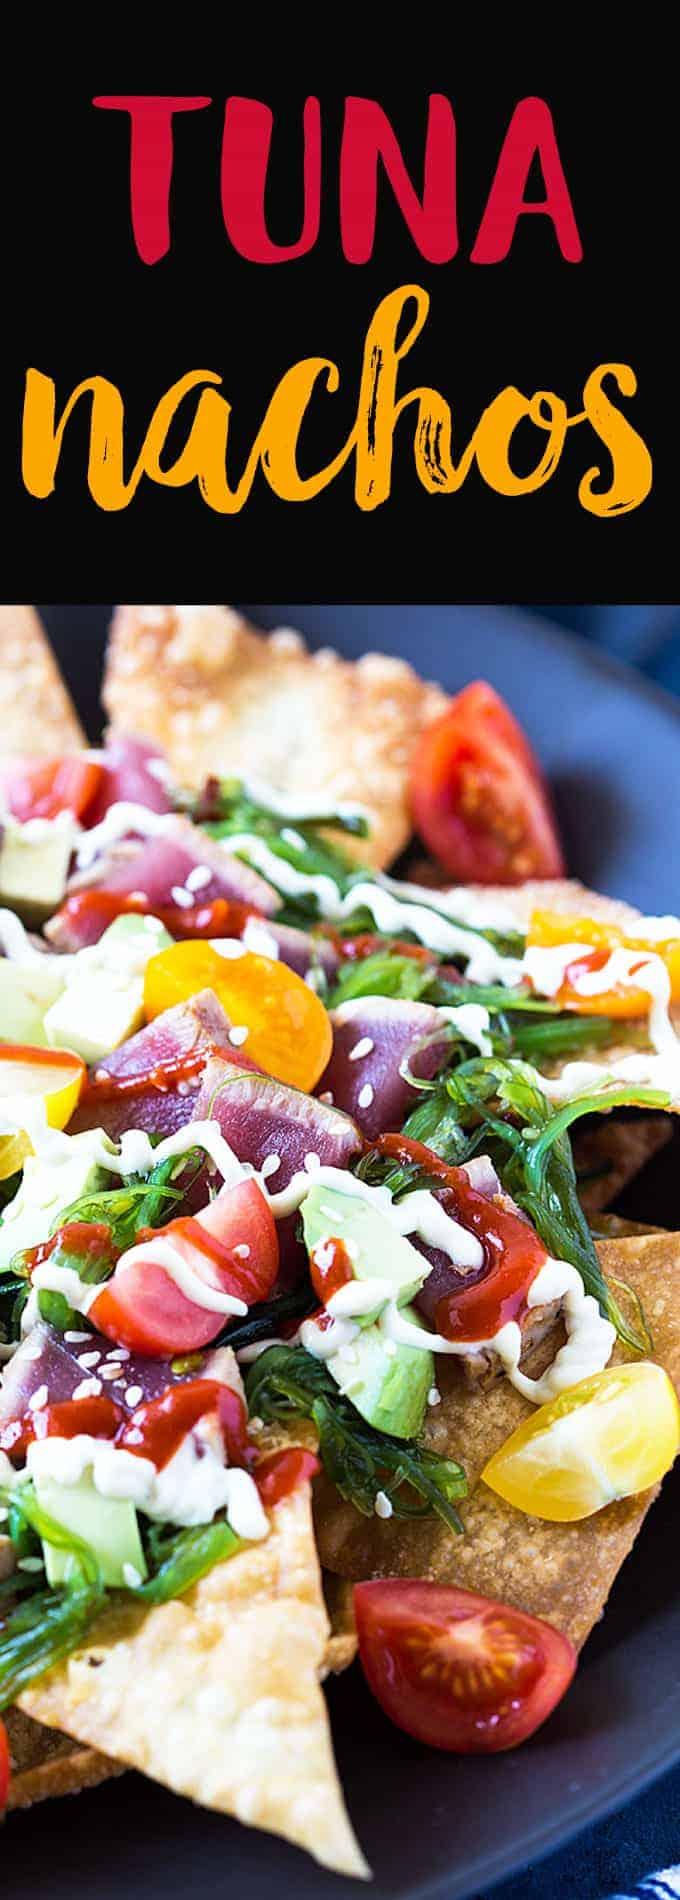 A closeup view of sliced seared tuna and seaweed salad over fried wontons.